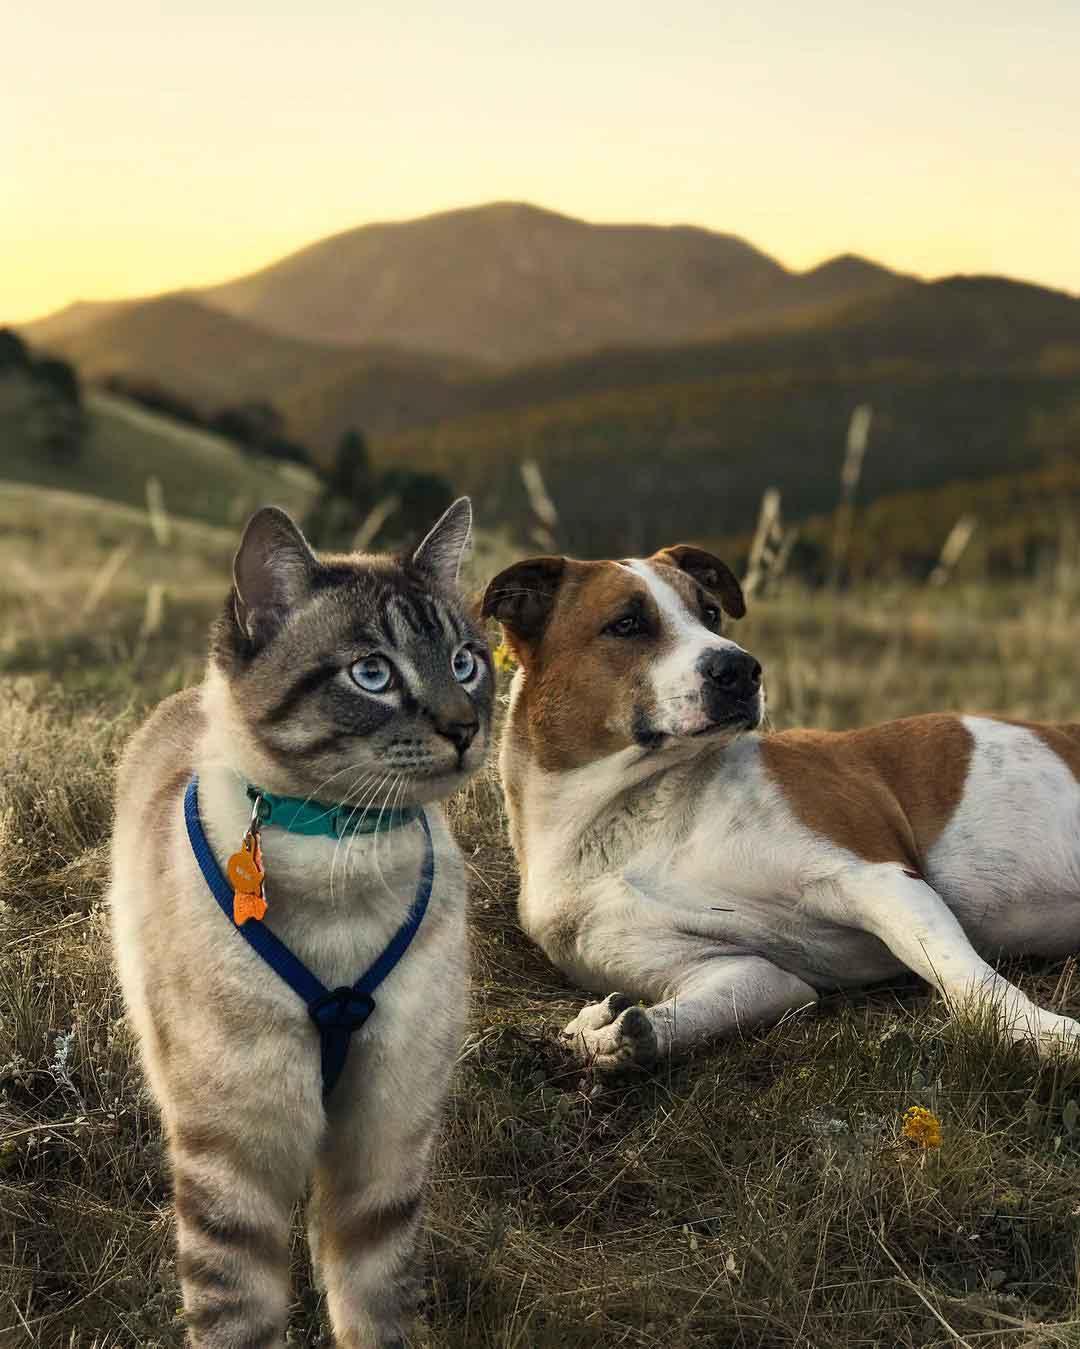 Henry Baloo chat chien adorent voyager ensemble